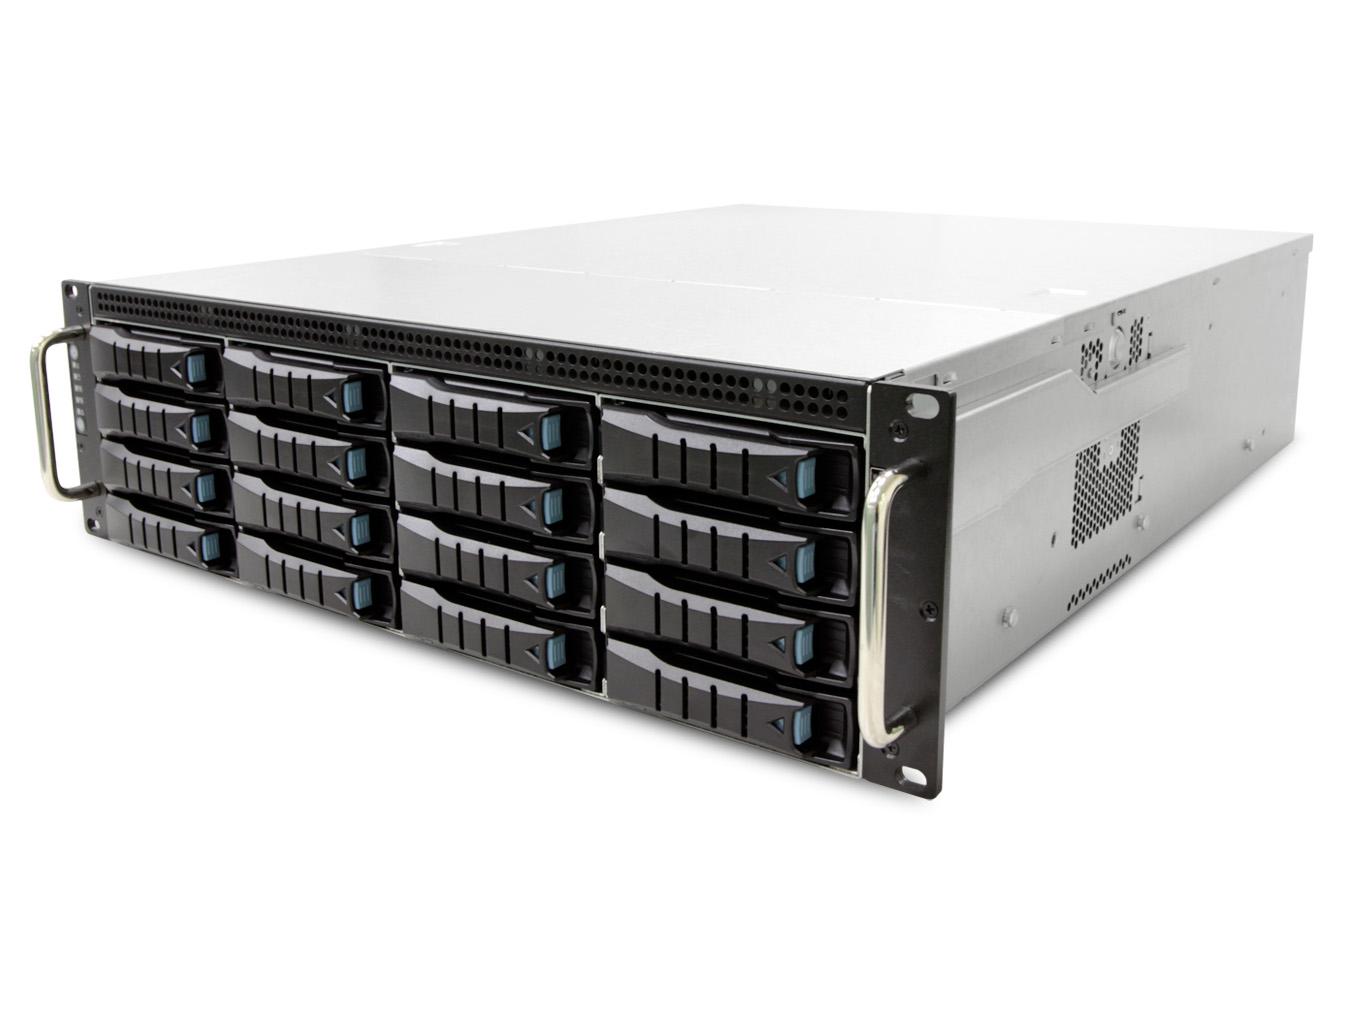 AIC RSC-3ETS XE1-3ETS0-02 3U 16-bay Storage Server Chassis